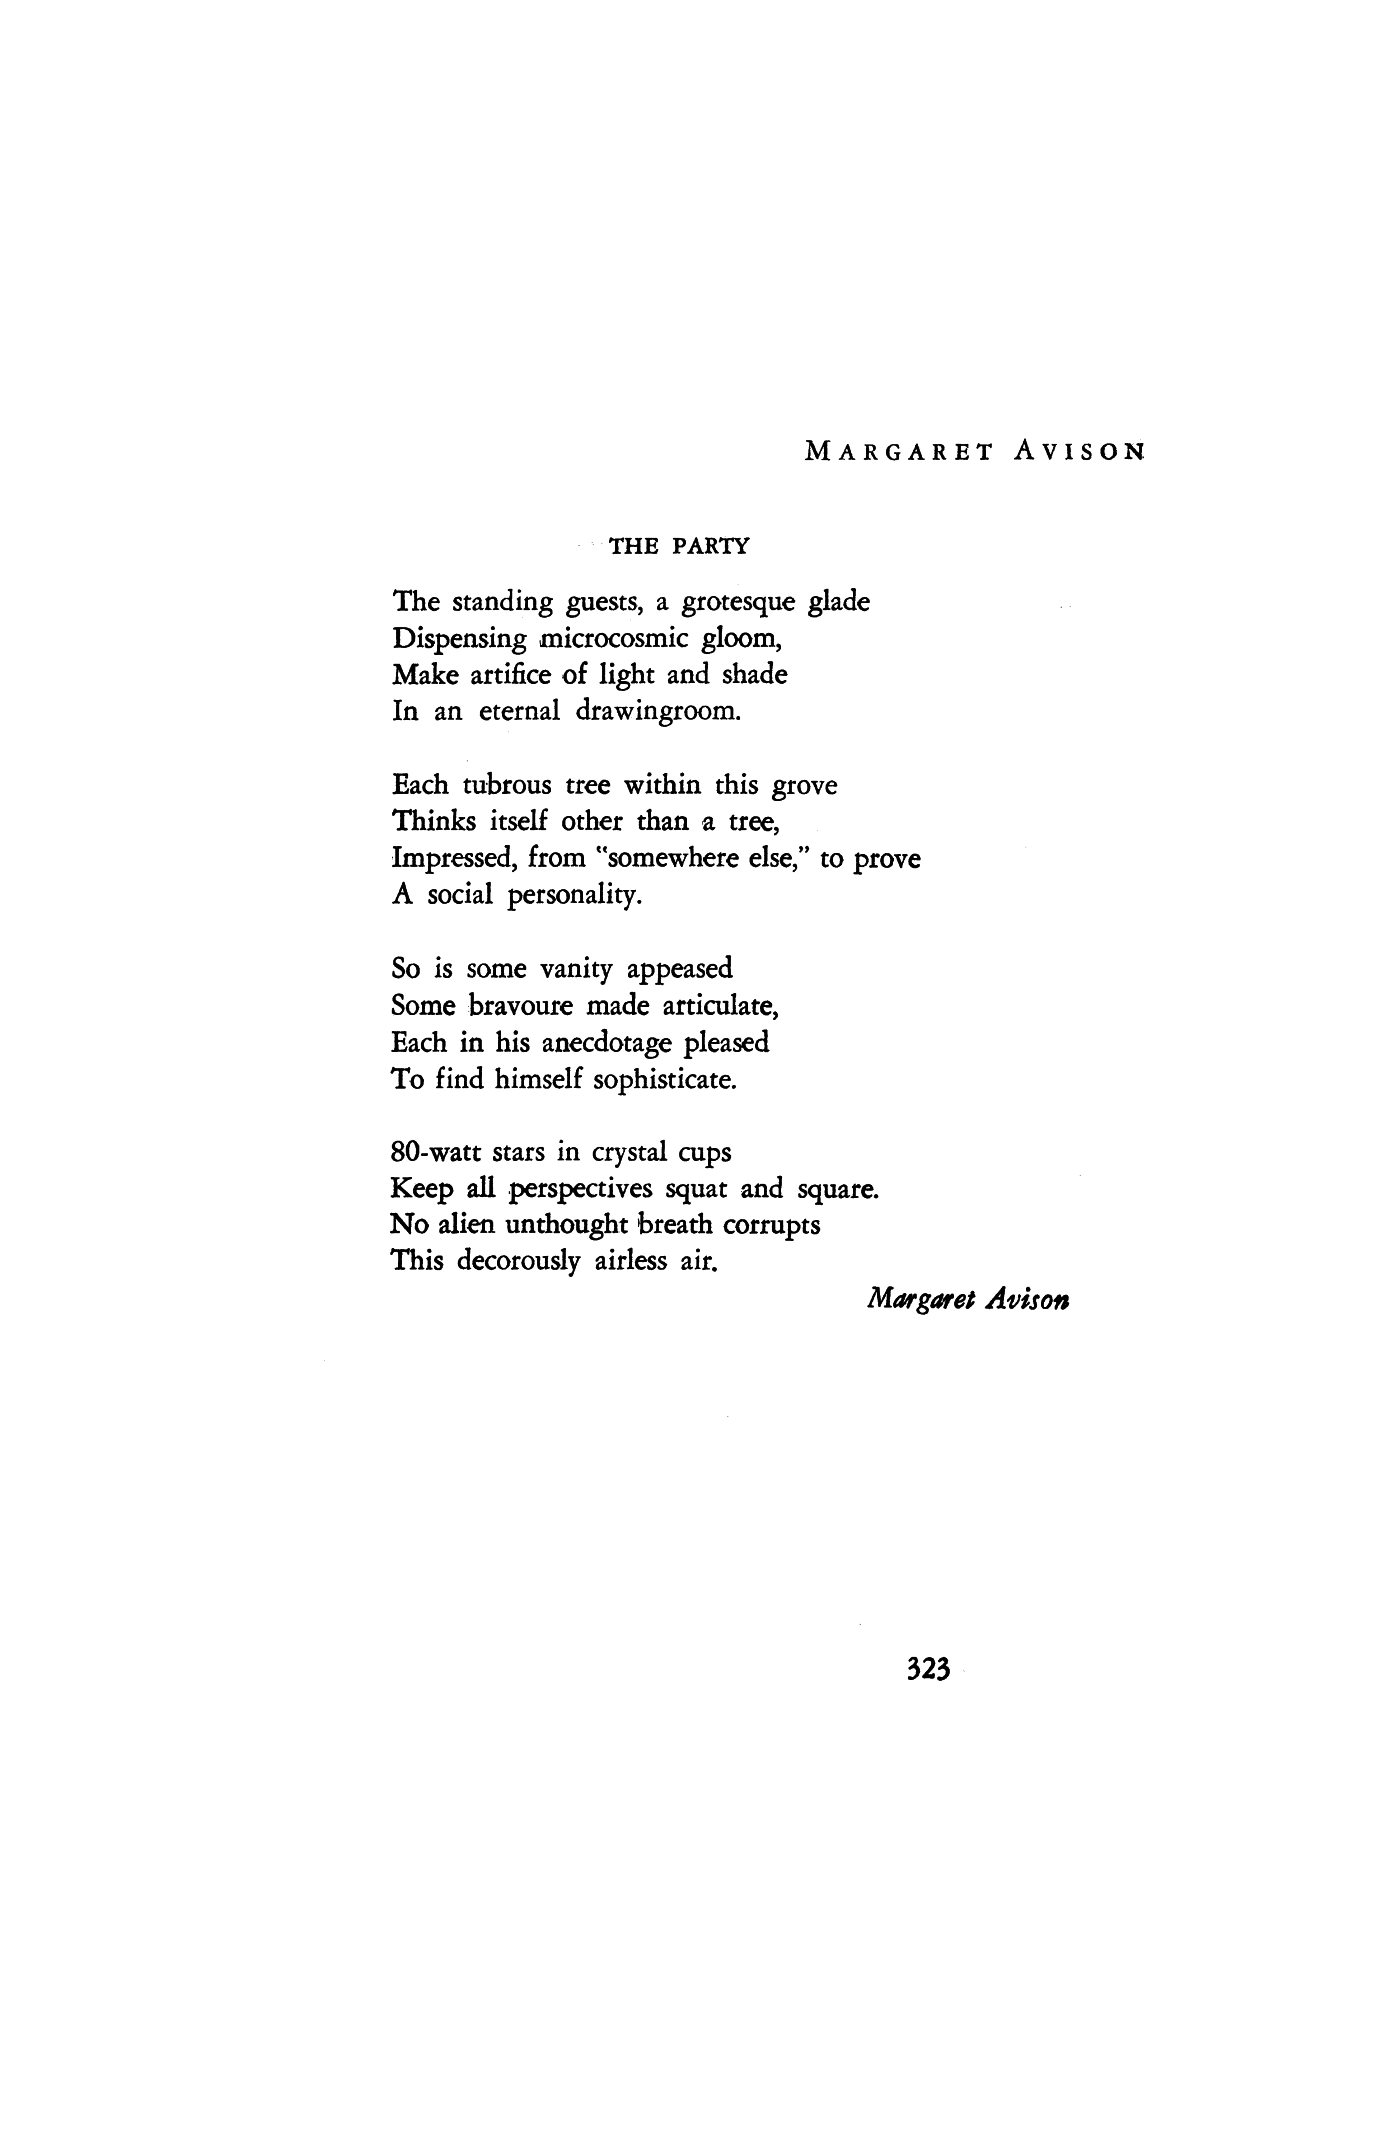 Margaret Avison poetry prize